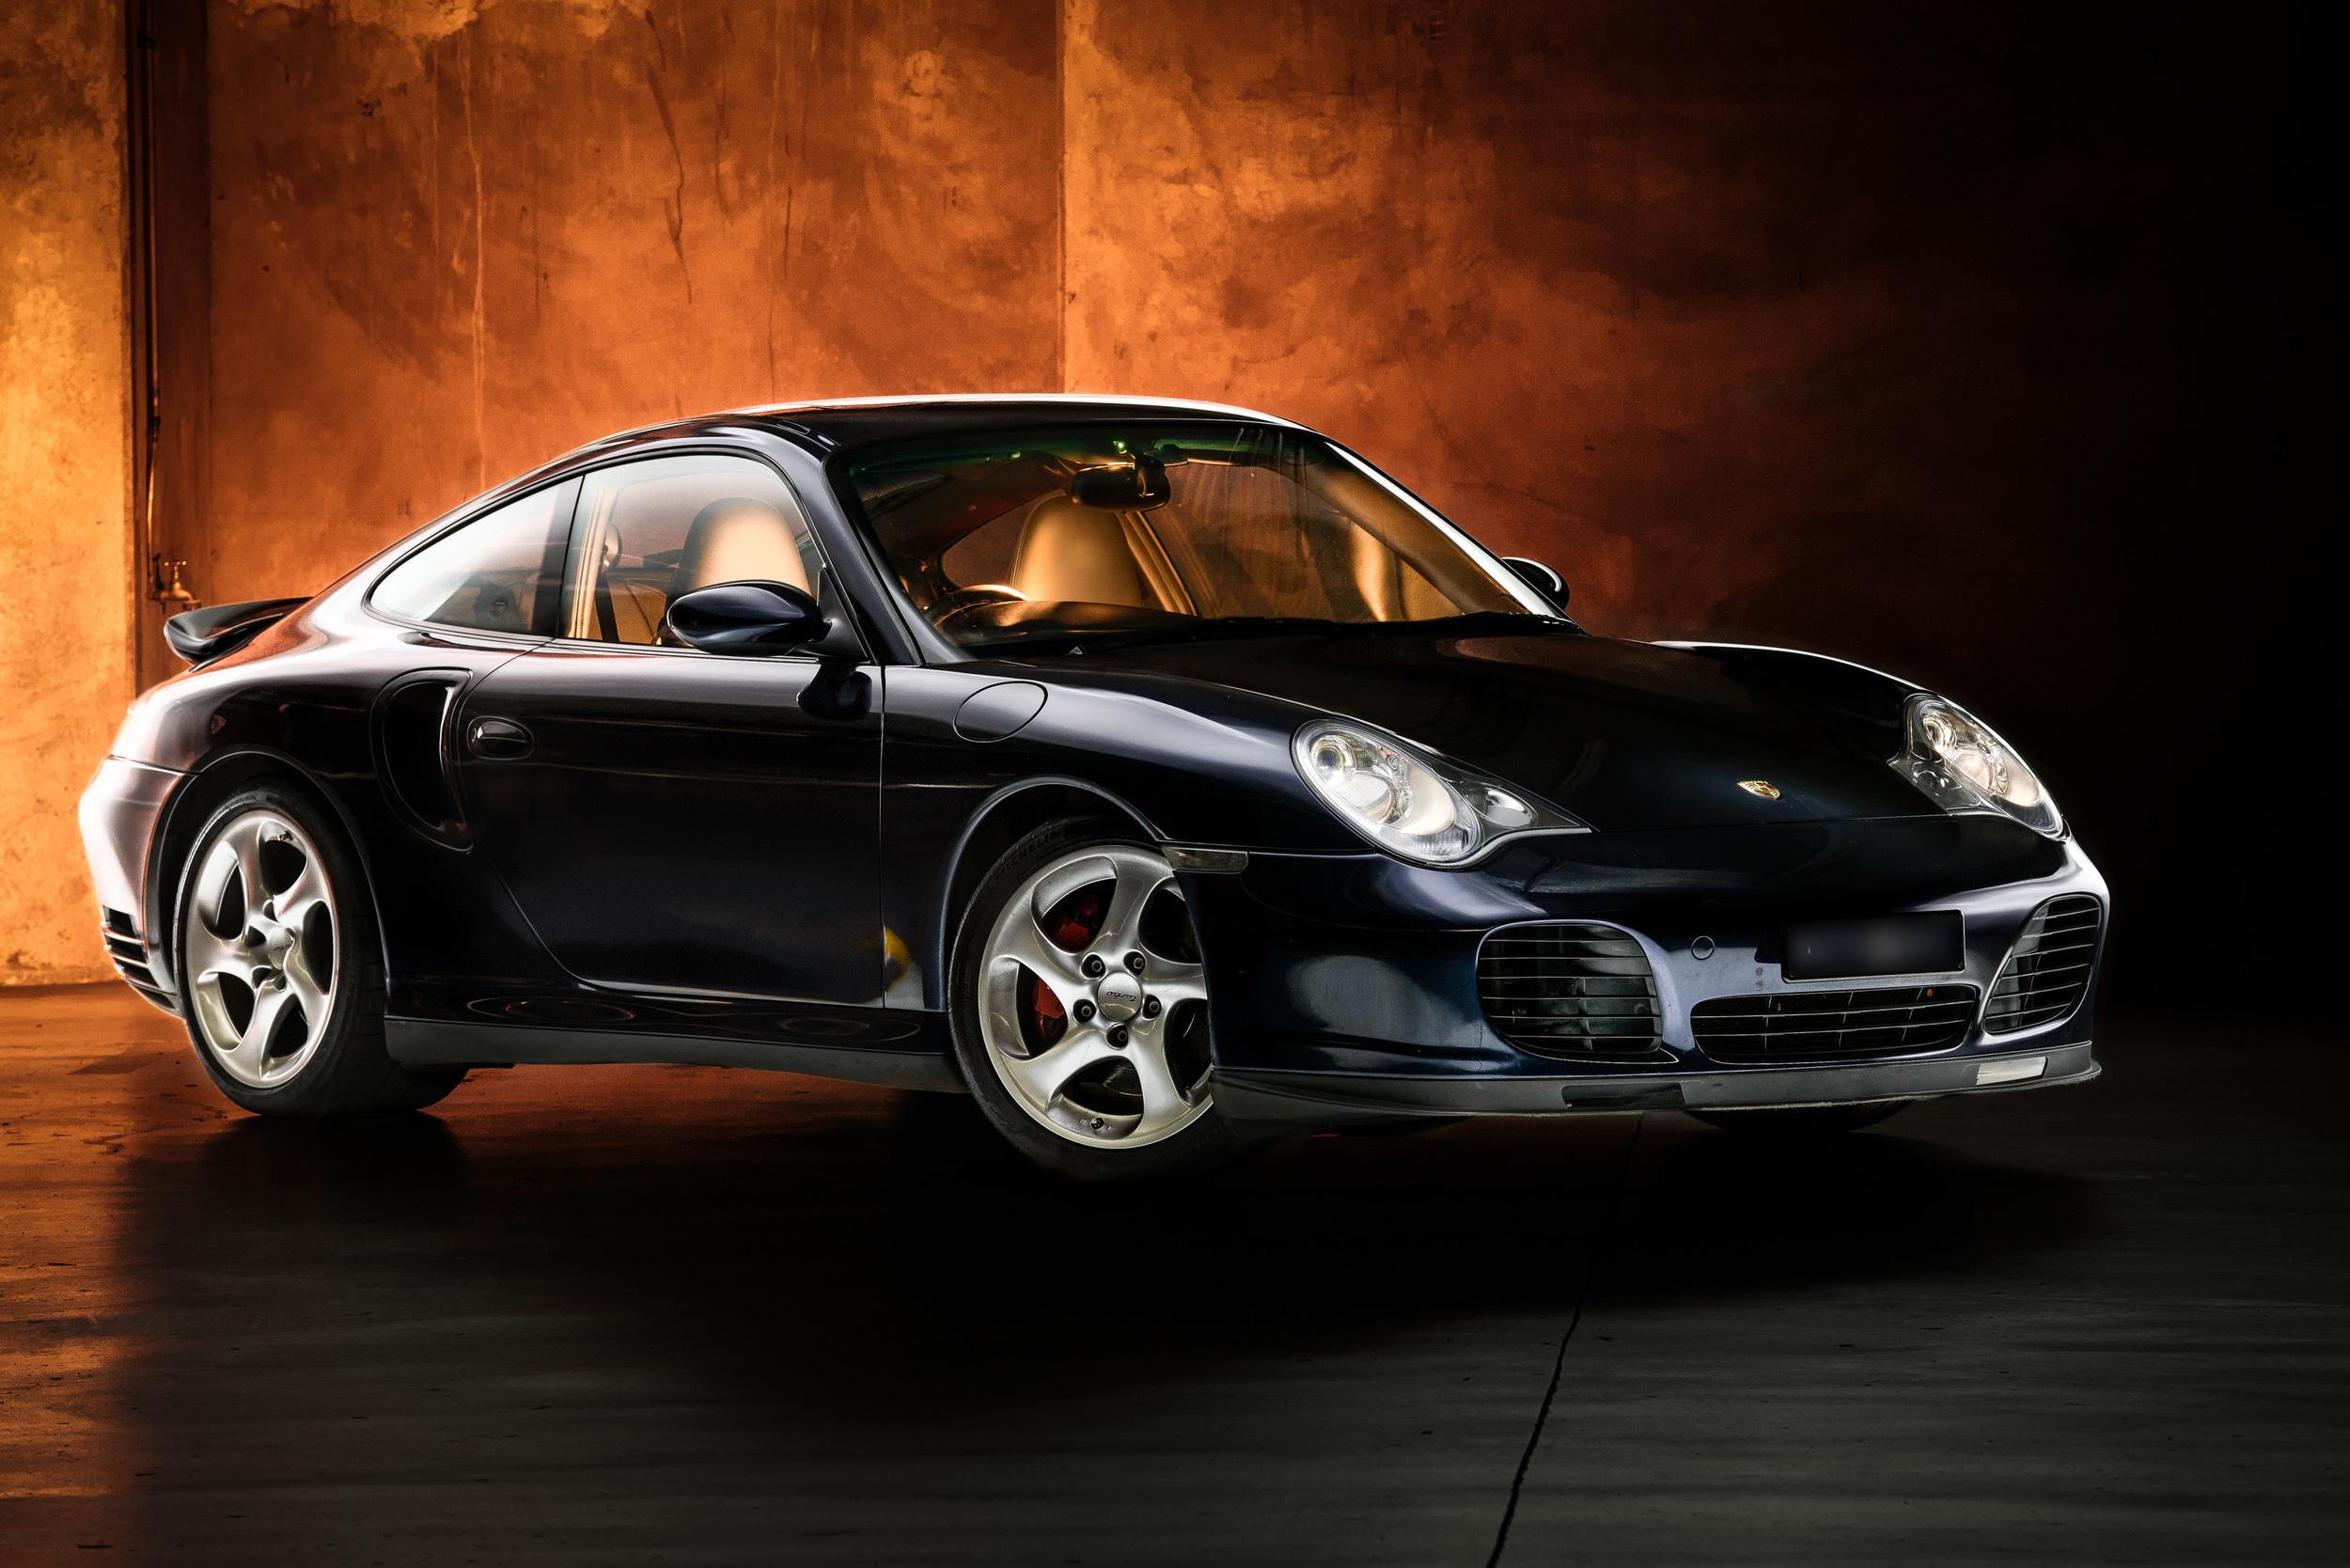 Light Painting - Porsche in car park